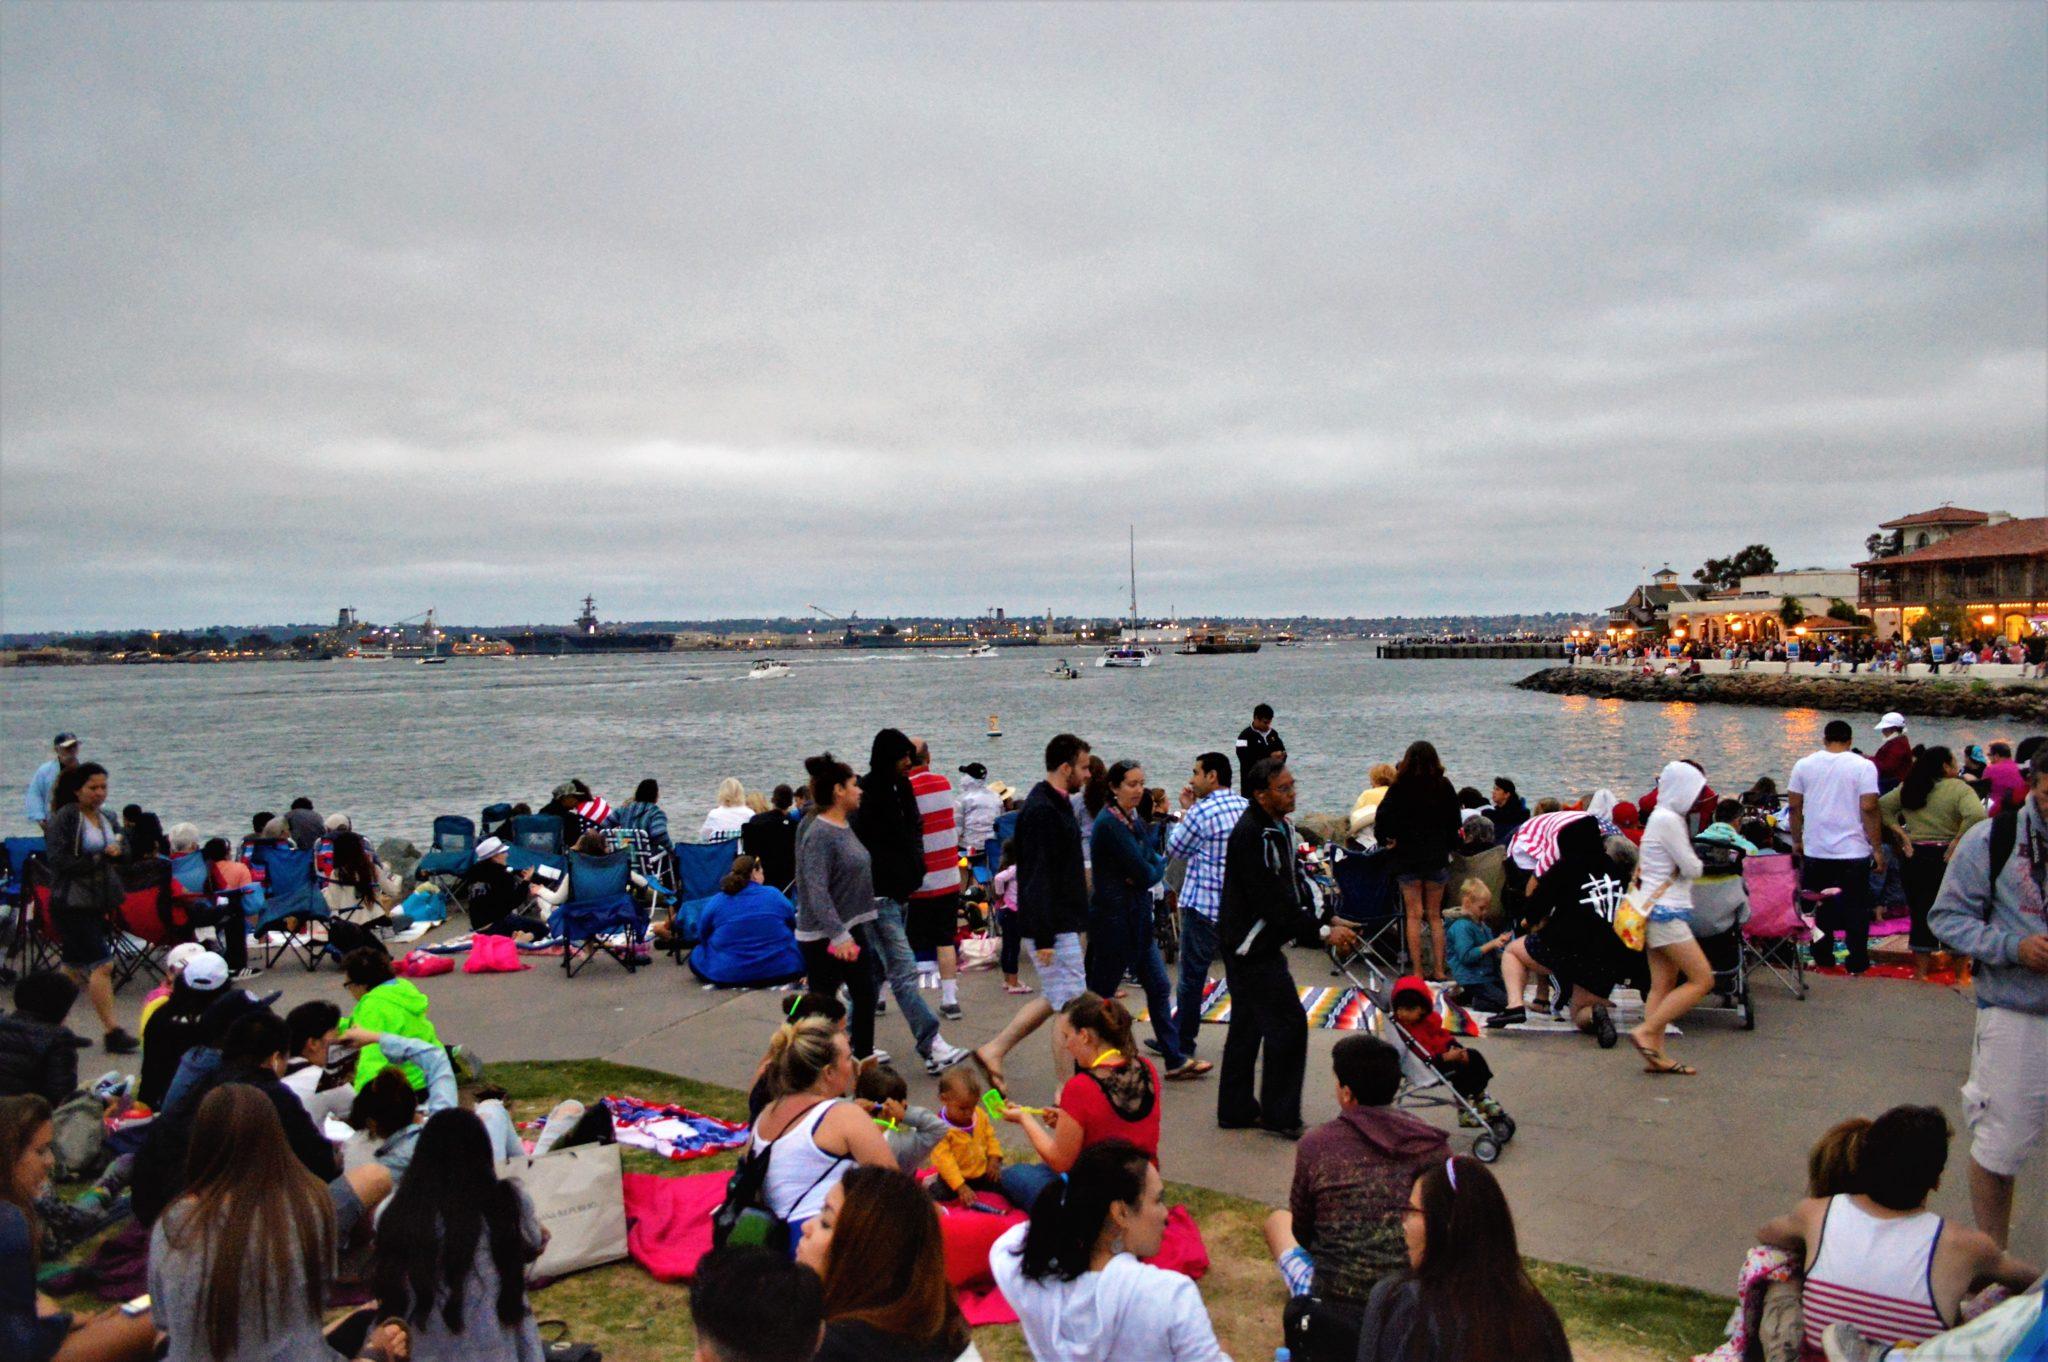 Big Bay Boom in San Diego spectators, California, 4th July